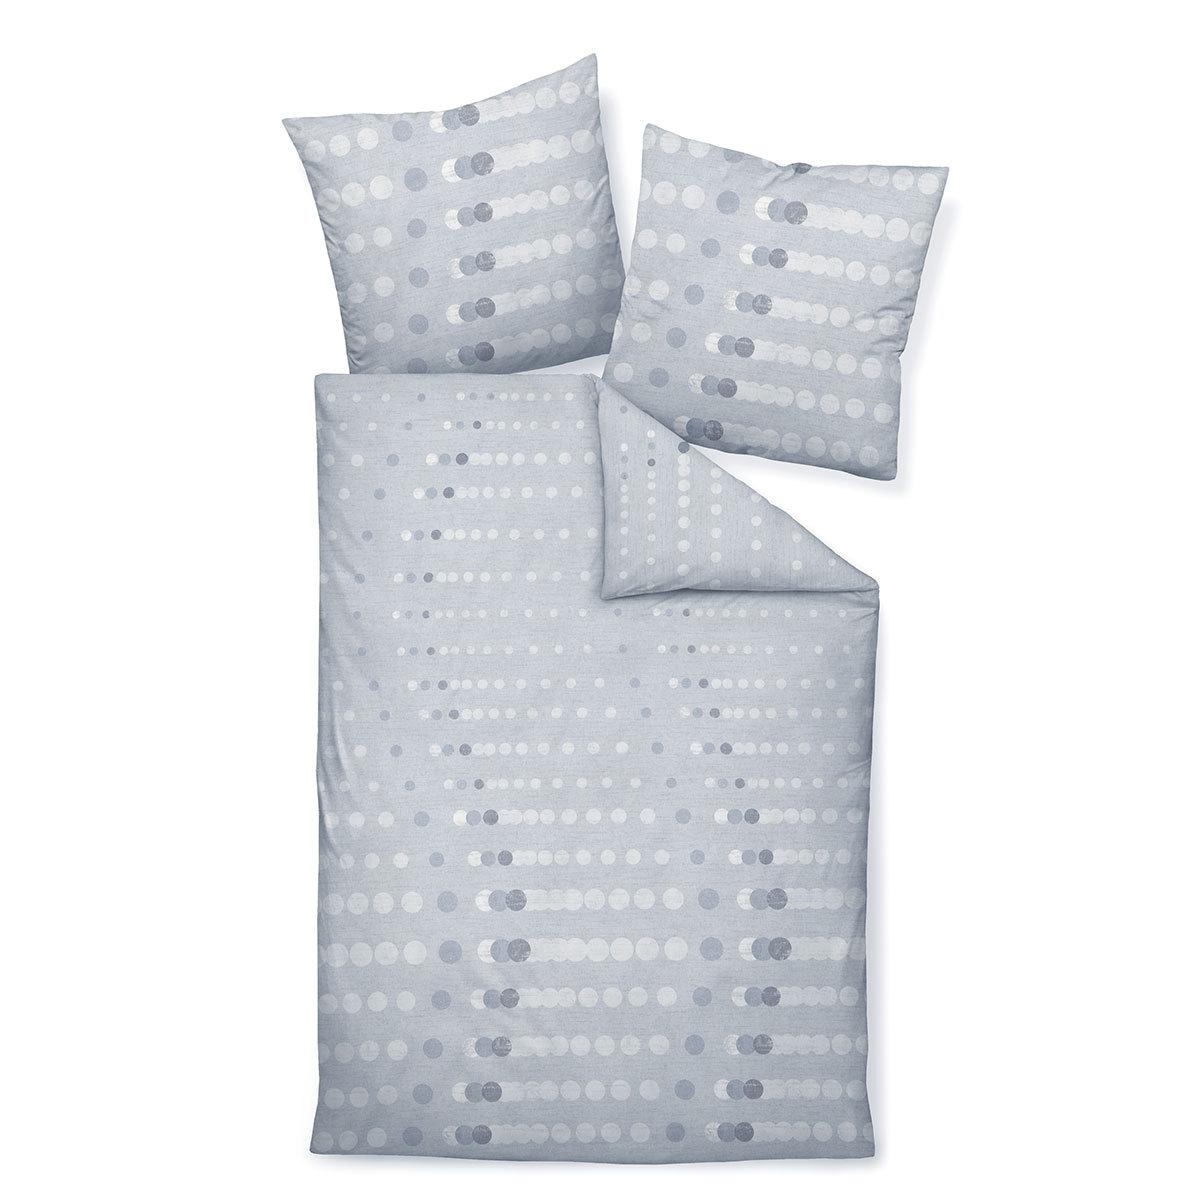 janine feinbiber bettw sche davos 65015 08 g nstig online. Black Bedroom Furniture Sets. Home Design Ideas